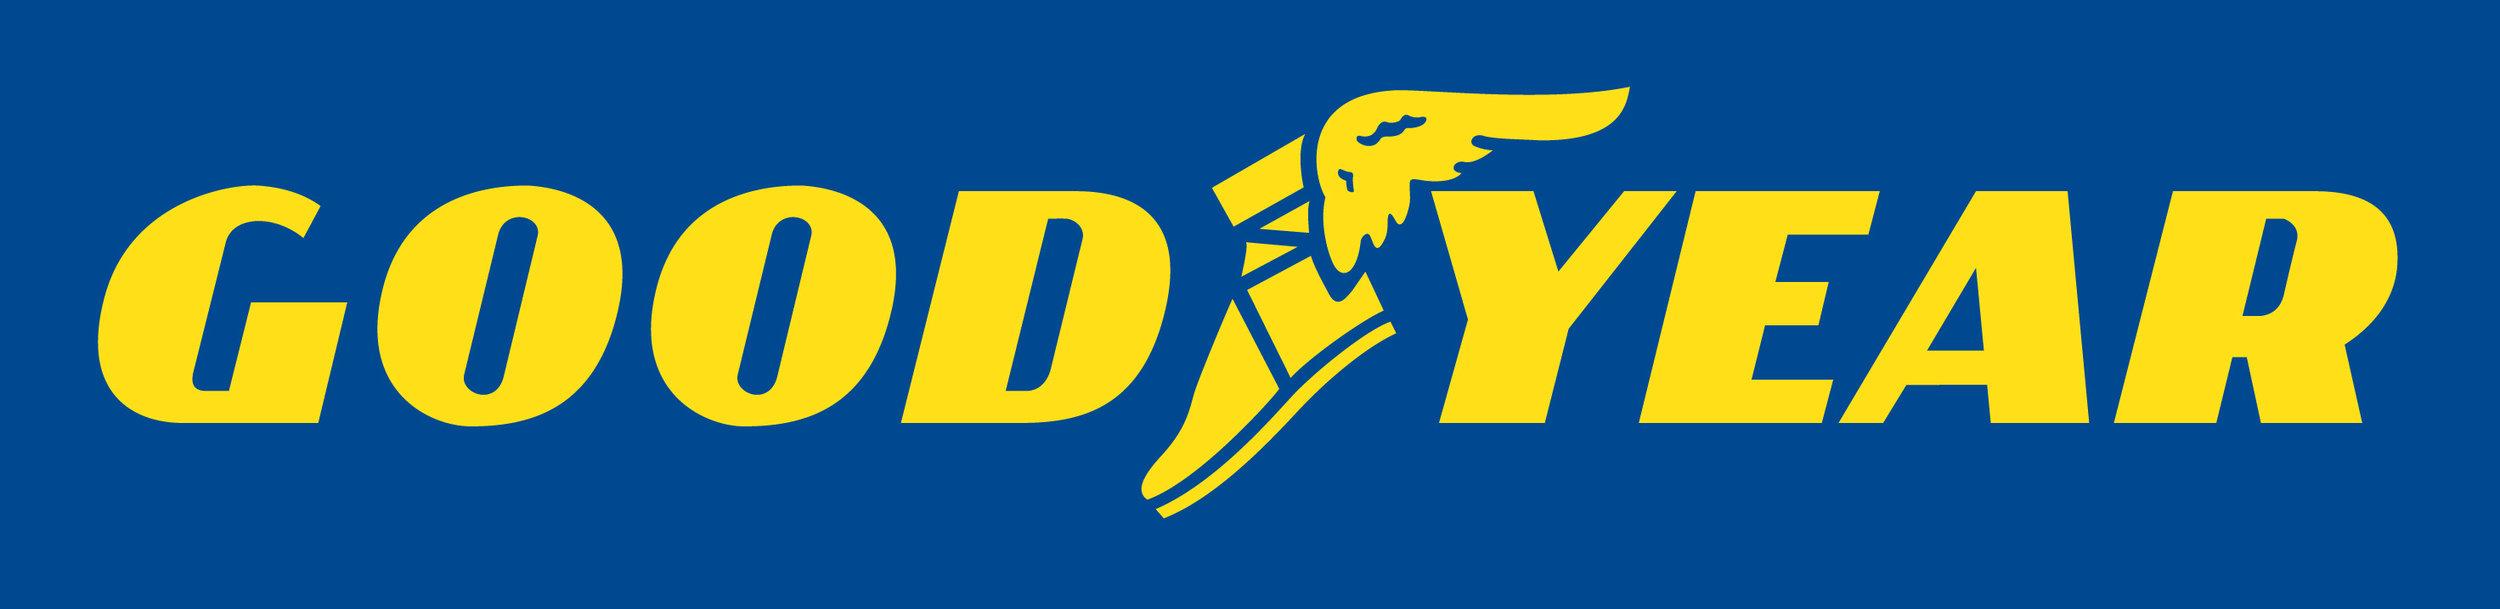 GOODYEAR Logo New.jpg